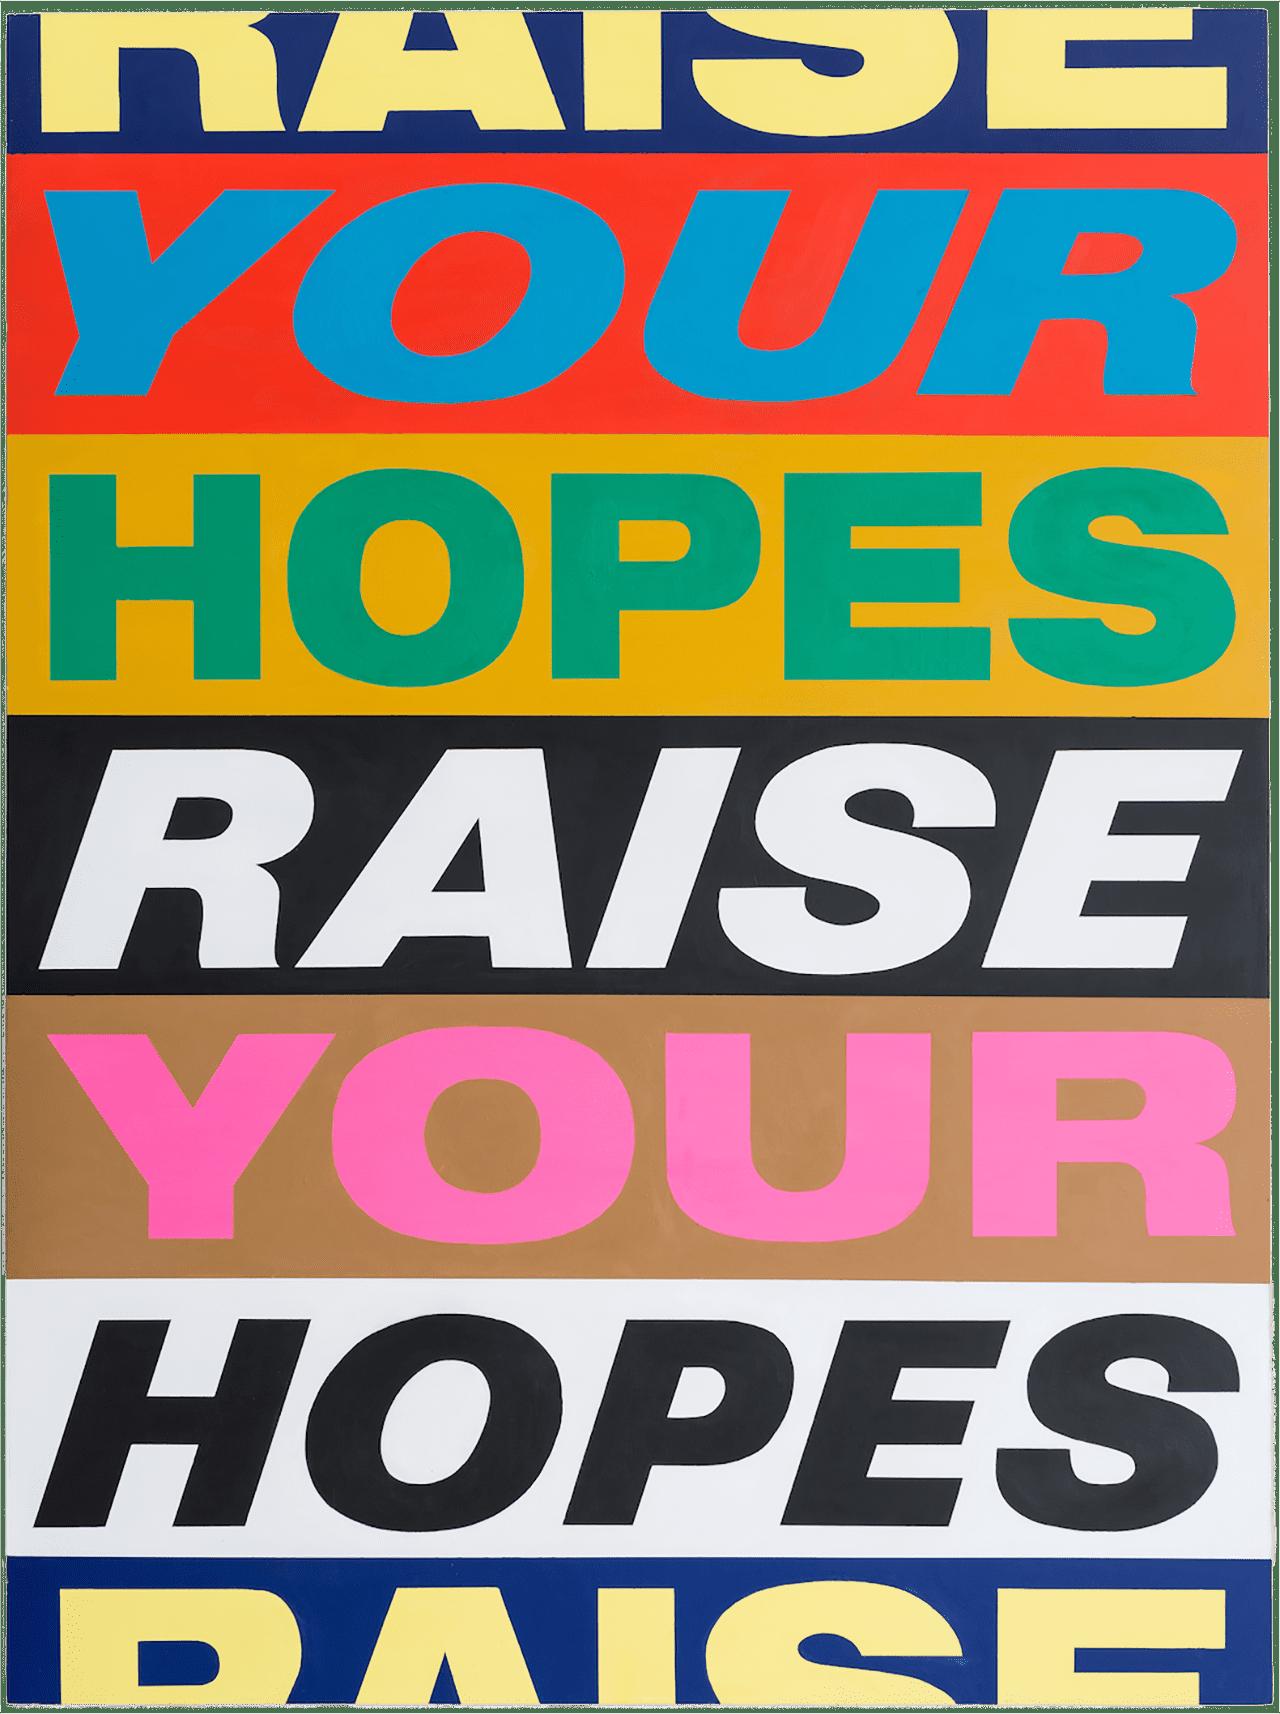 Raise Your Hopes, 2017